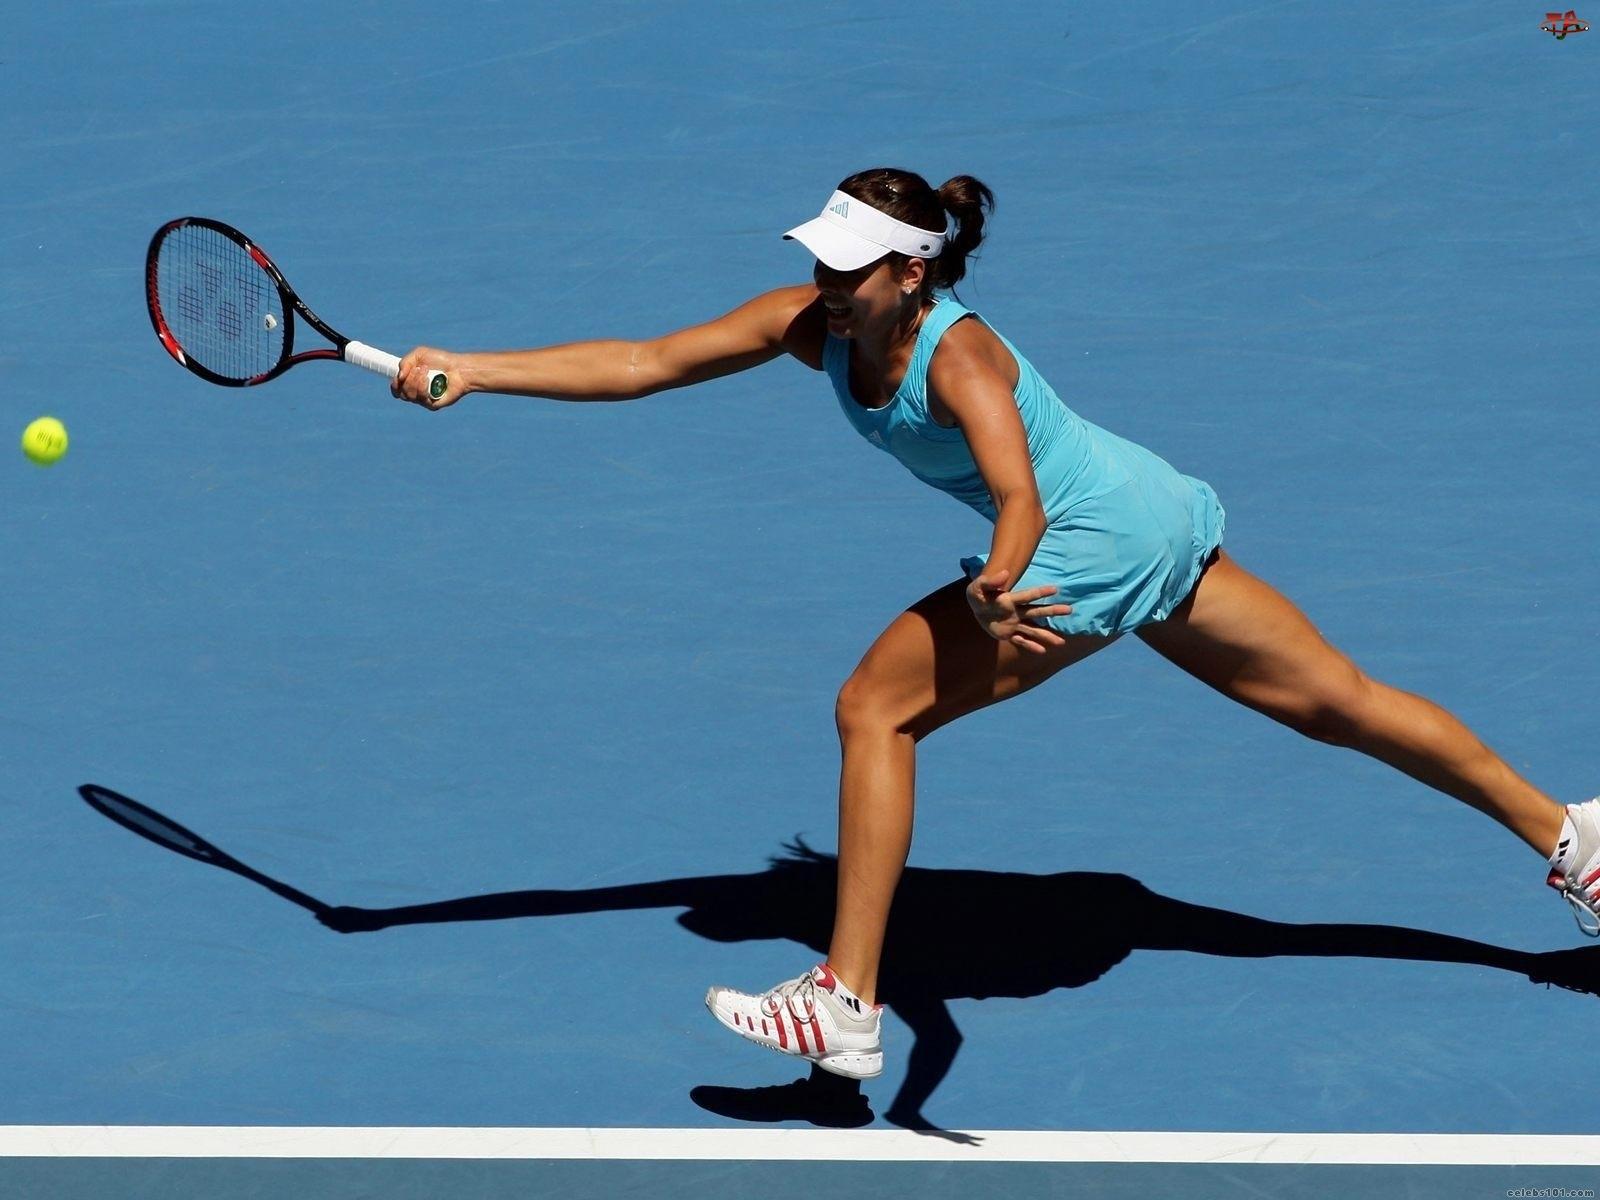 Tenis, Ana Ivanović, Gra